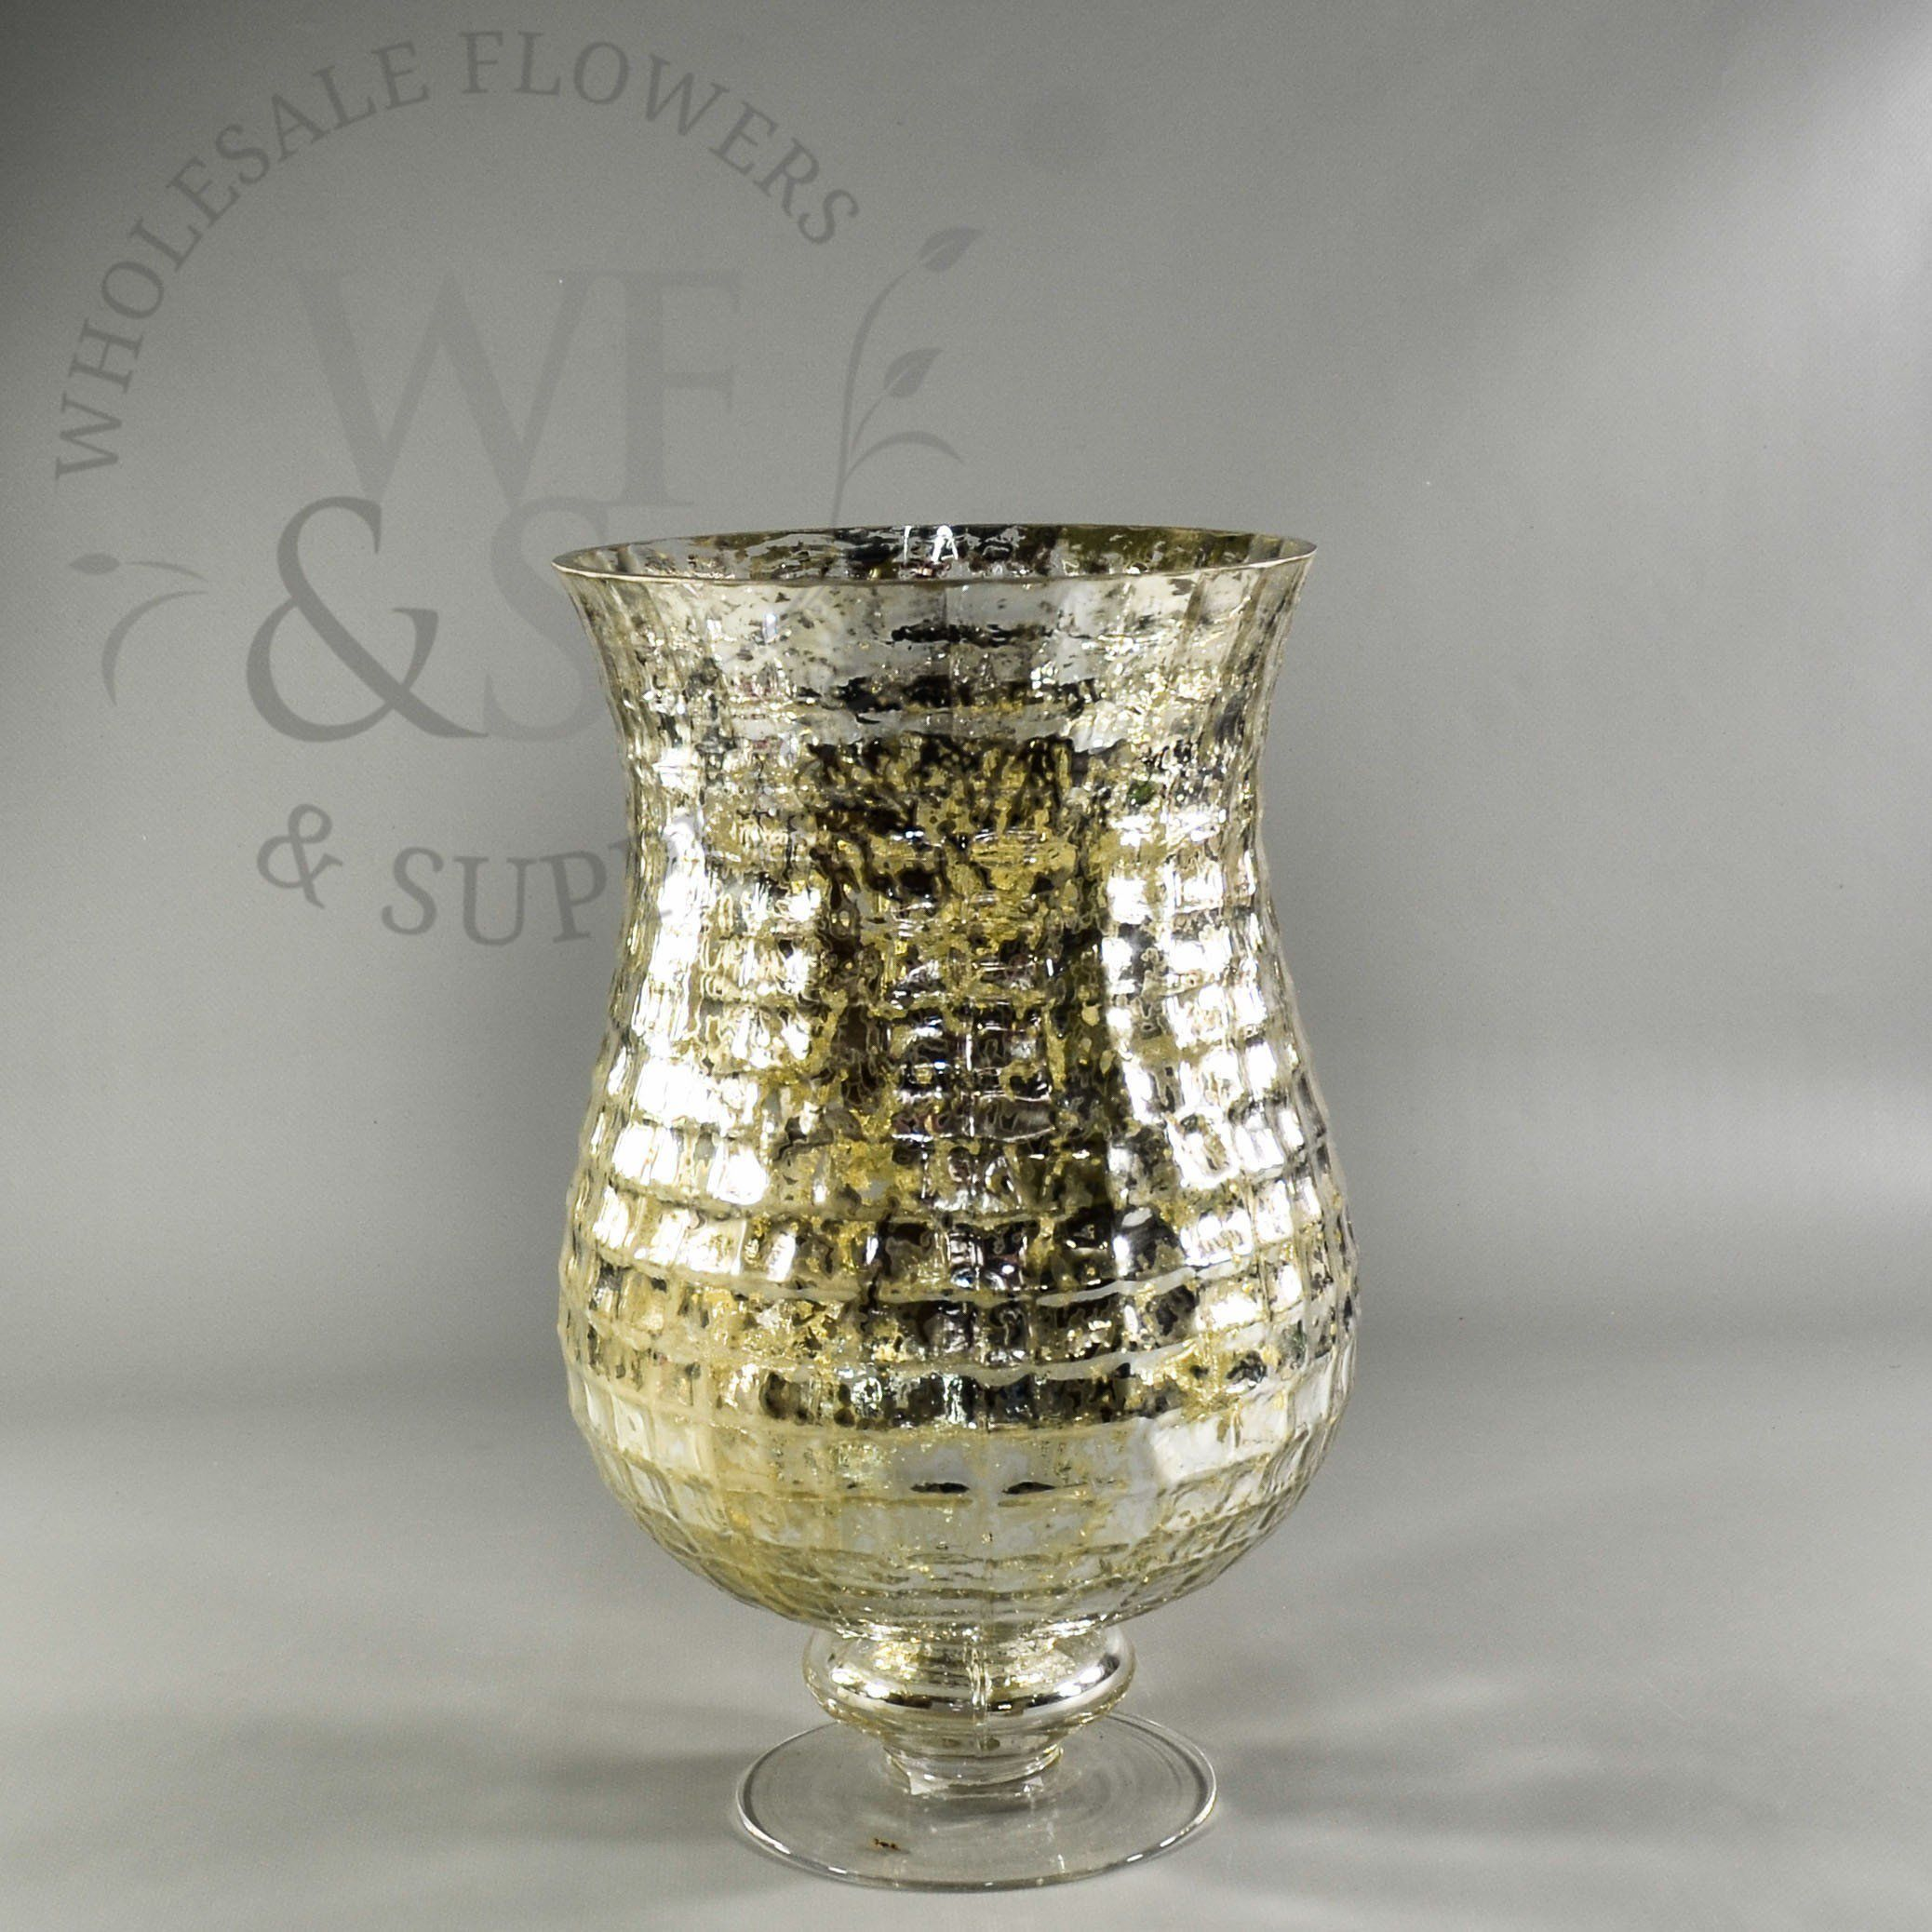 Pedestal Footed Mercury Glass Mosaic Vase | Wedding decor